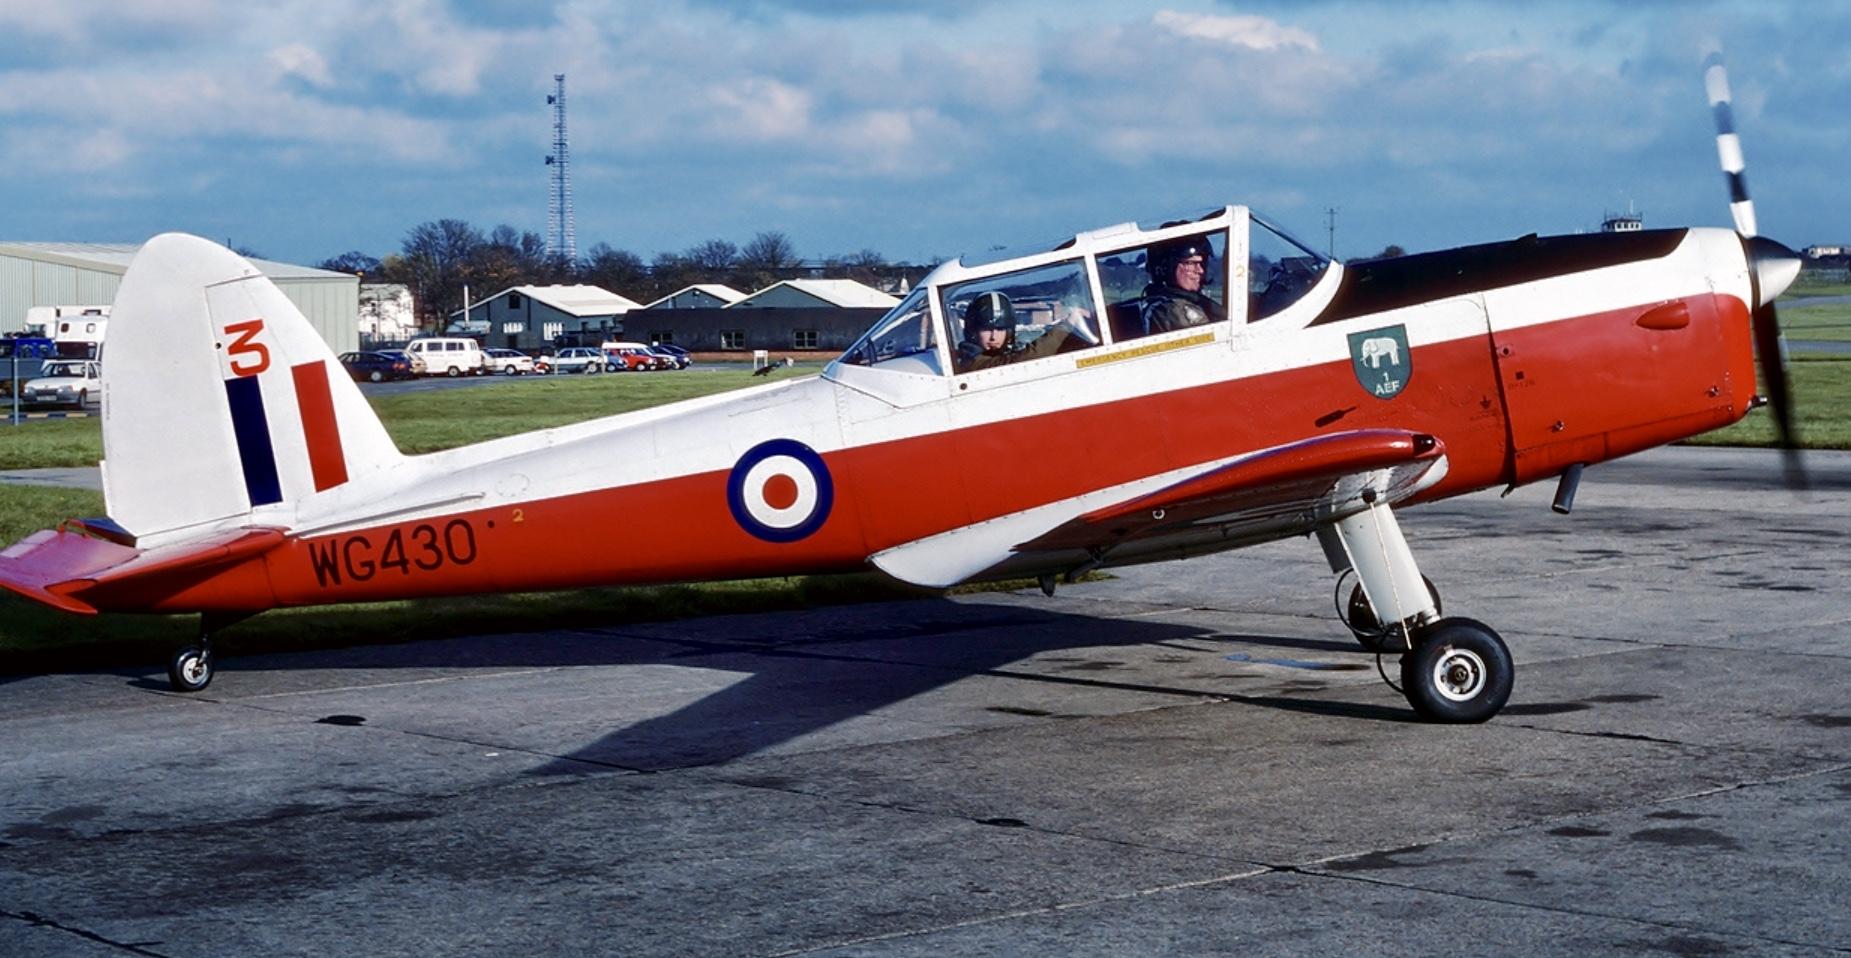 Circa 1980's - AEF1 at RAF Manston